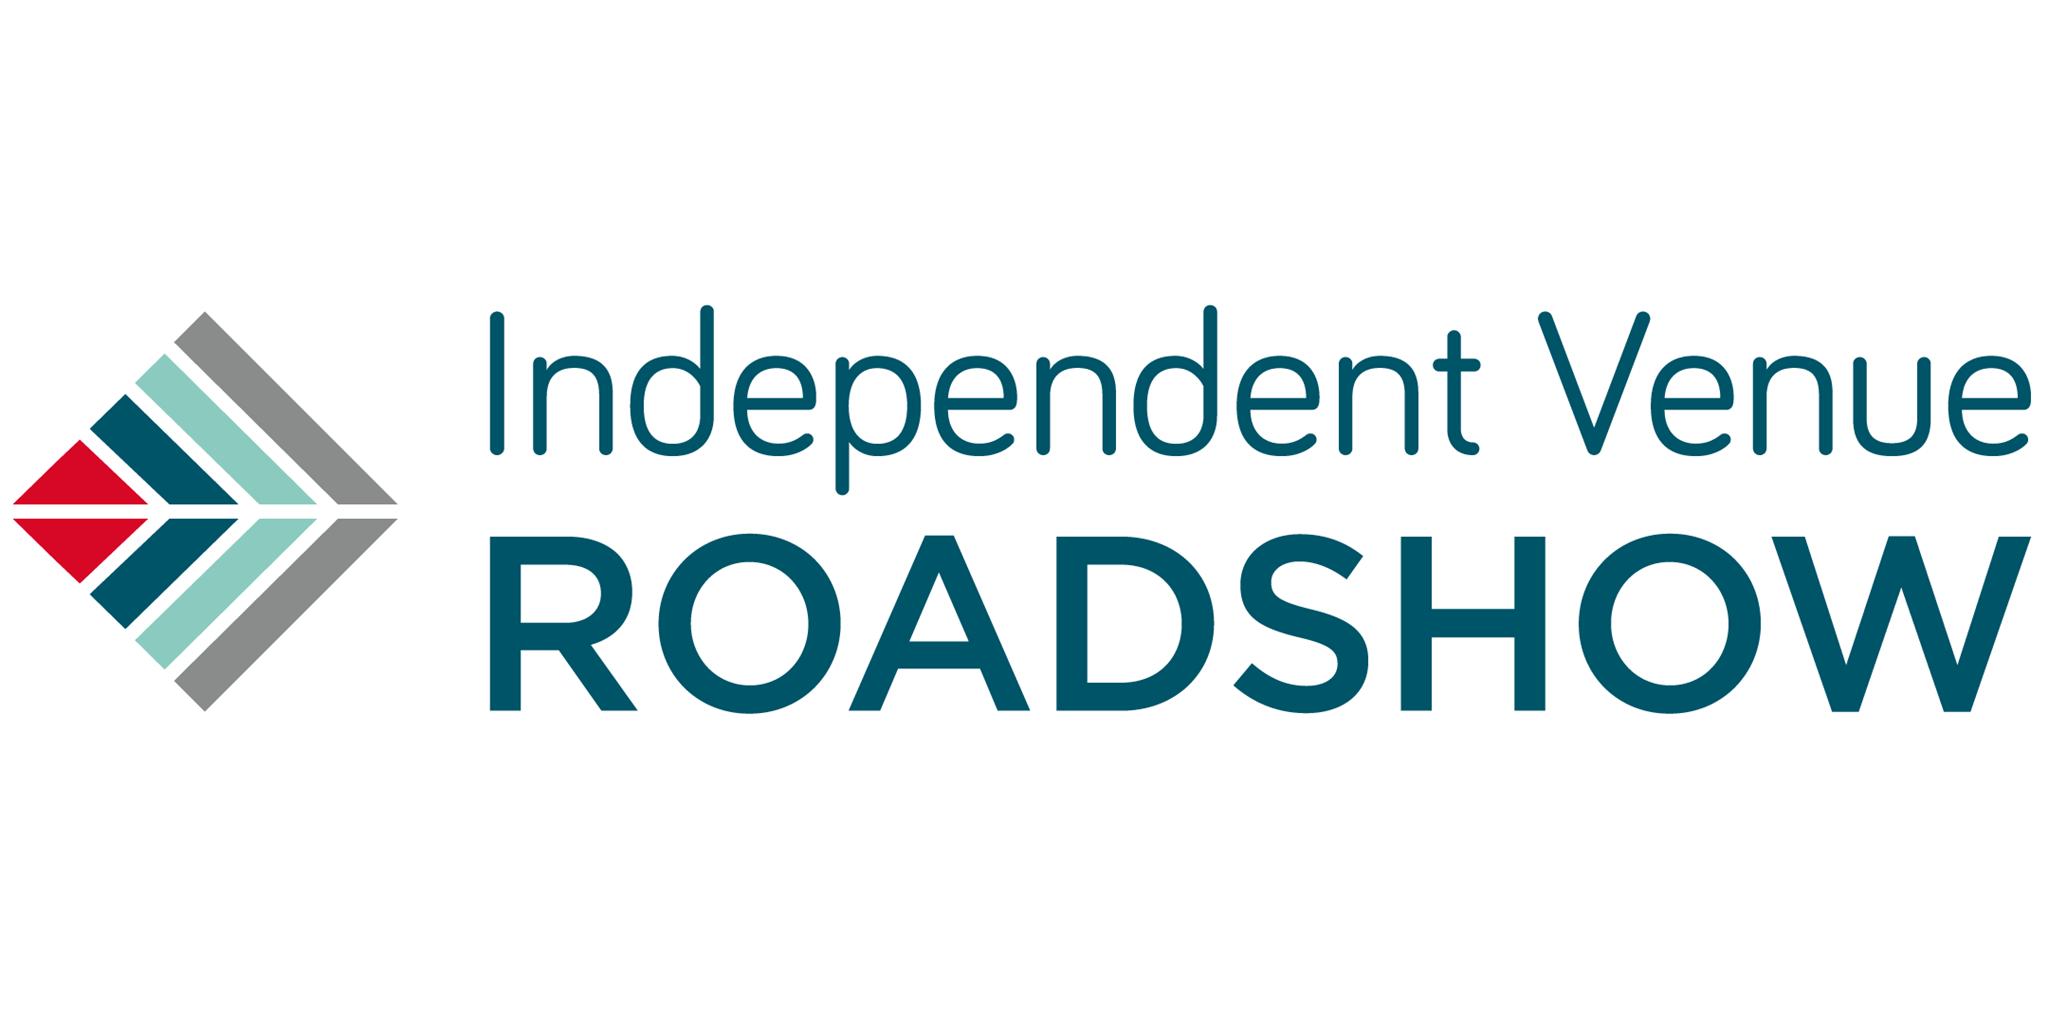 Independent Venue Roadshow January 2019 - Cov